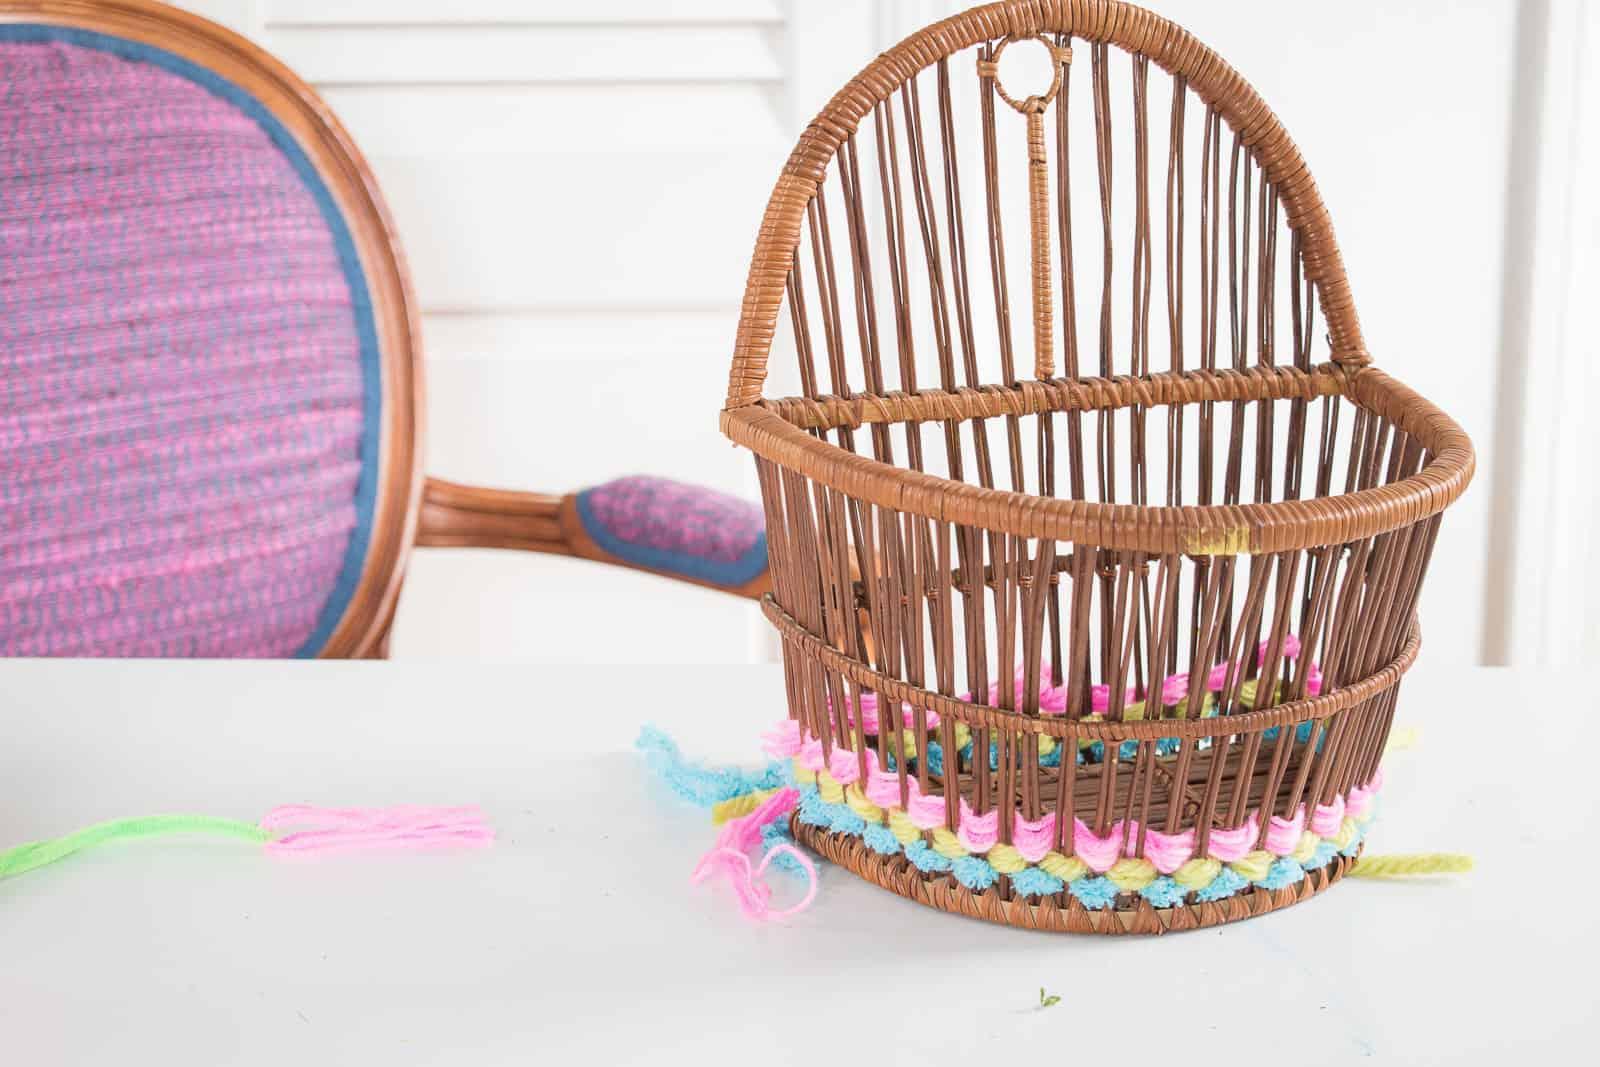 weaving yarn through a basket